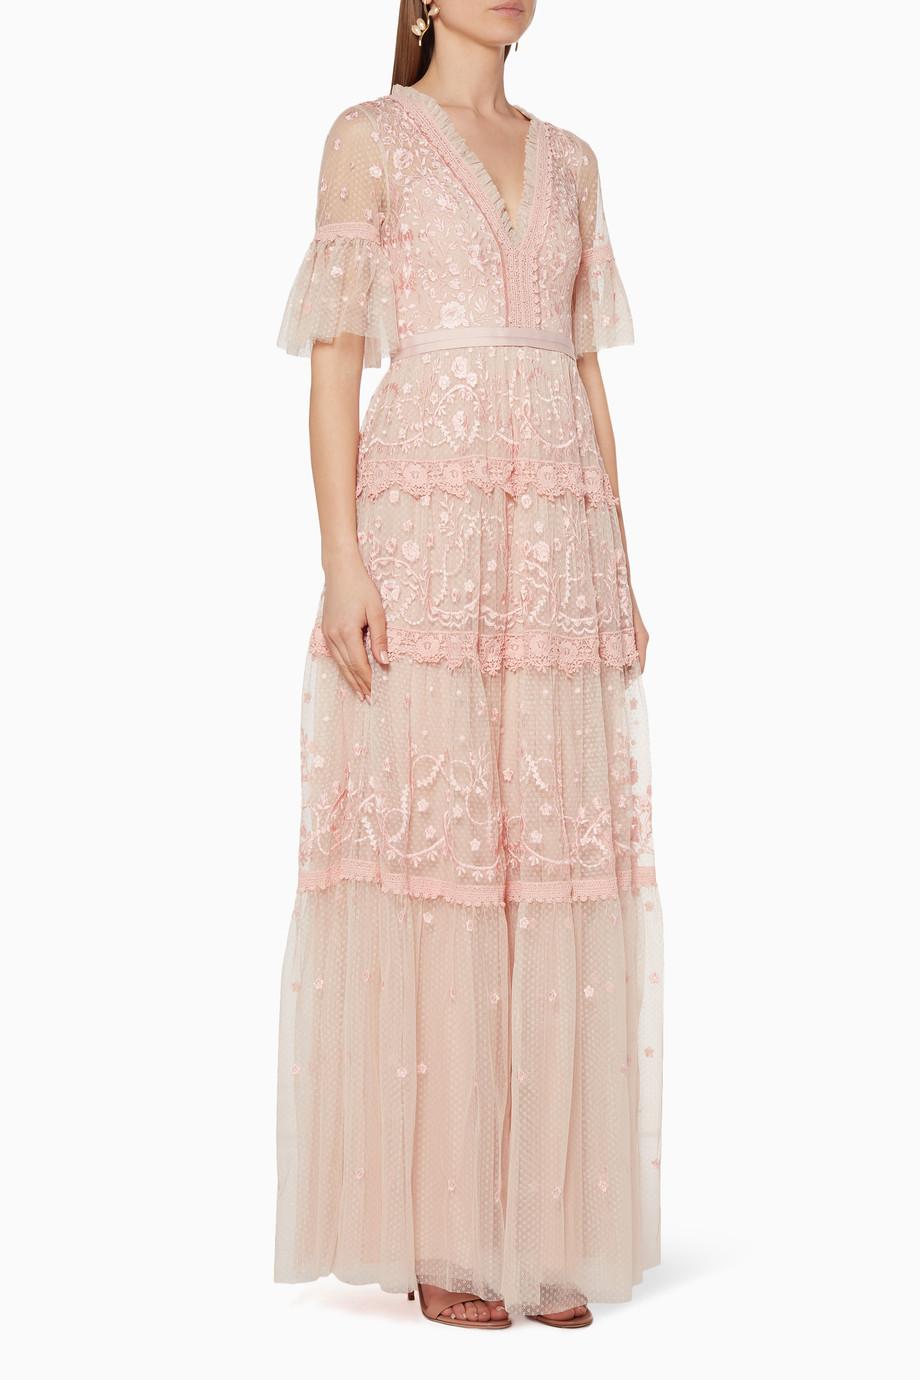 02ce74d4002d Shop Needle & Thread Pink Midsummer Lace Gown for Women ...